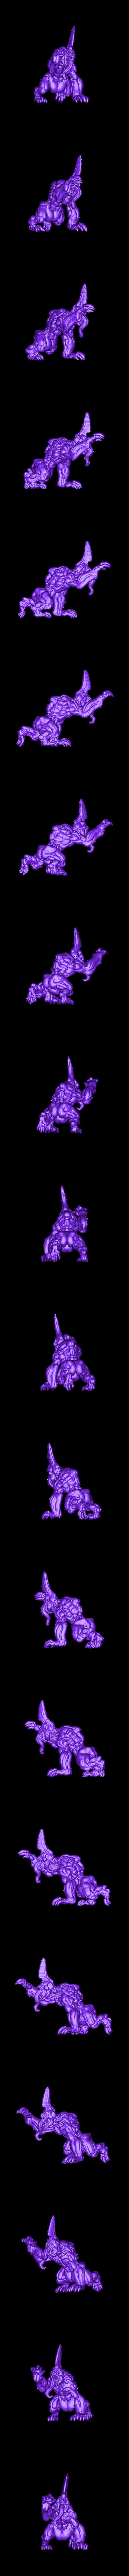 Hound1.stl Download free STL file Hell Hounds • 3D printer design, duncanshadow